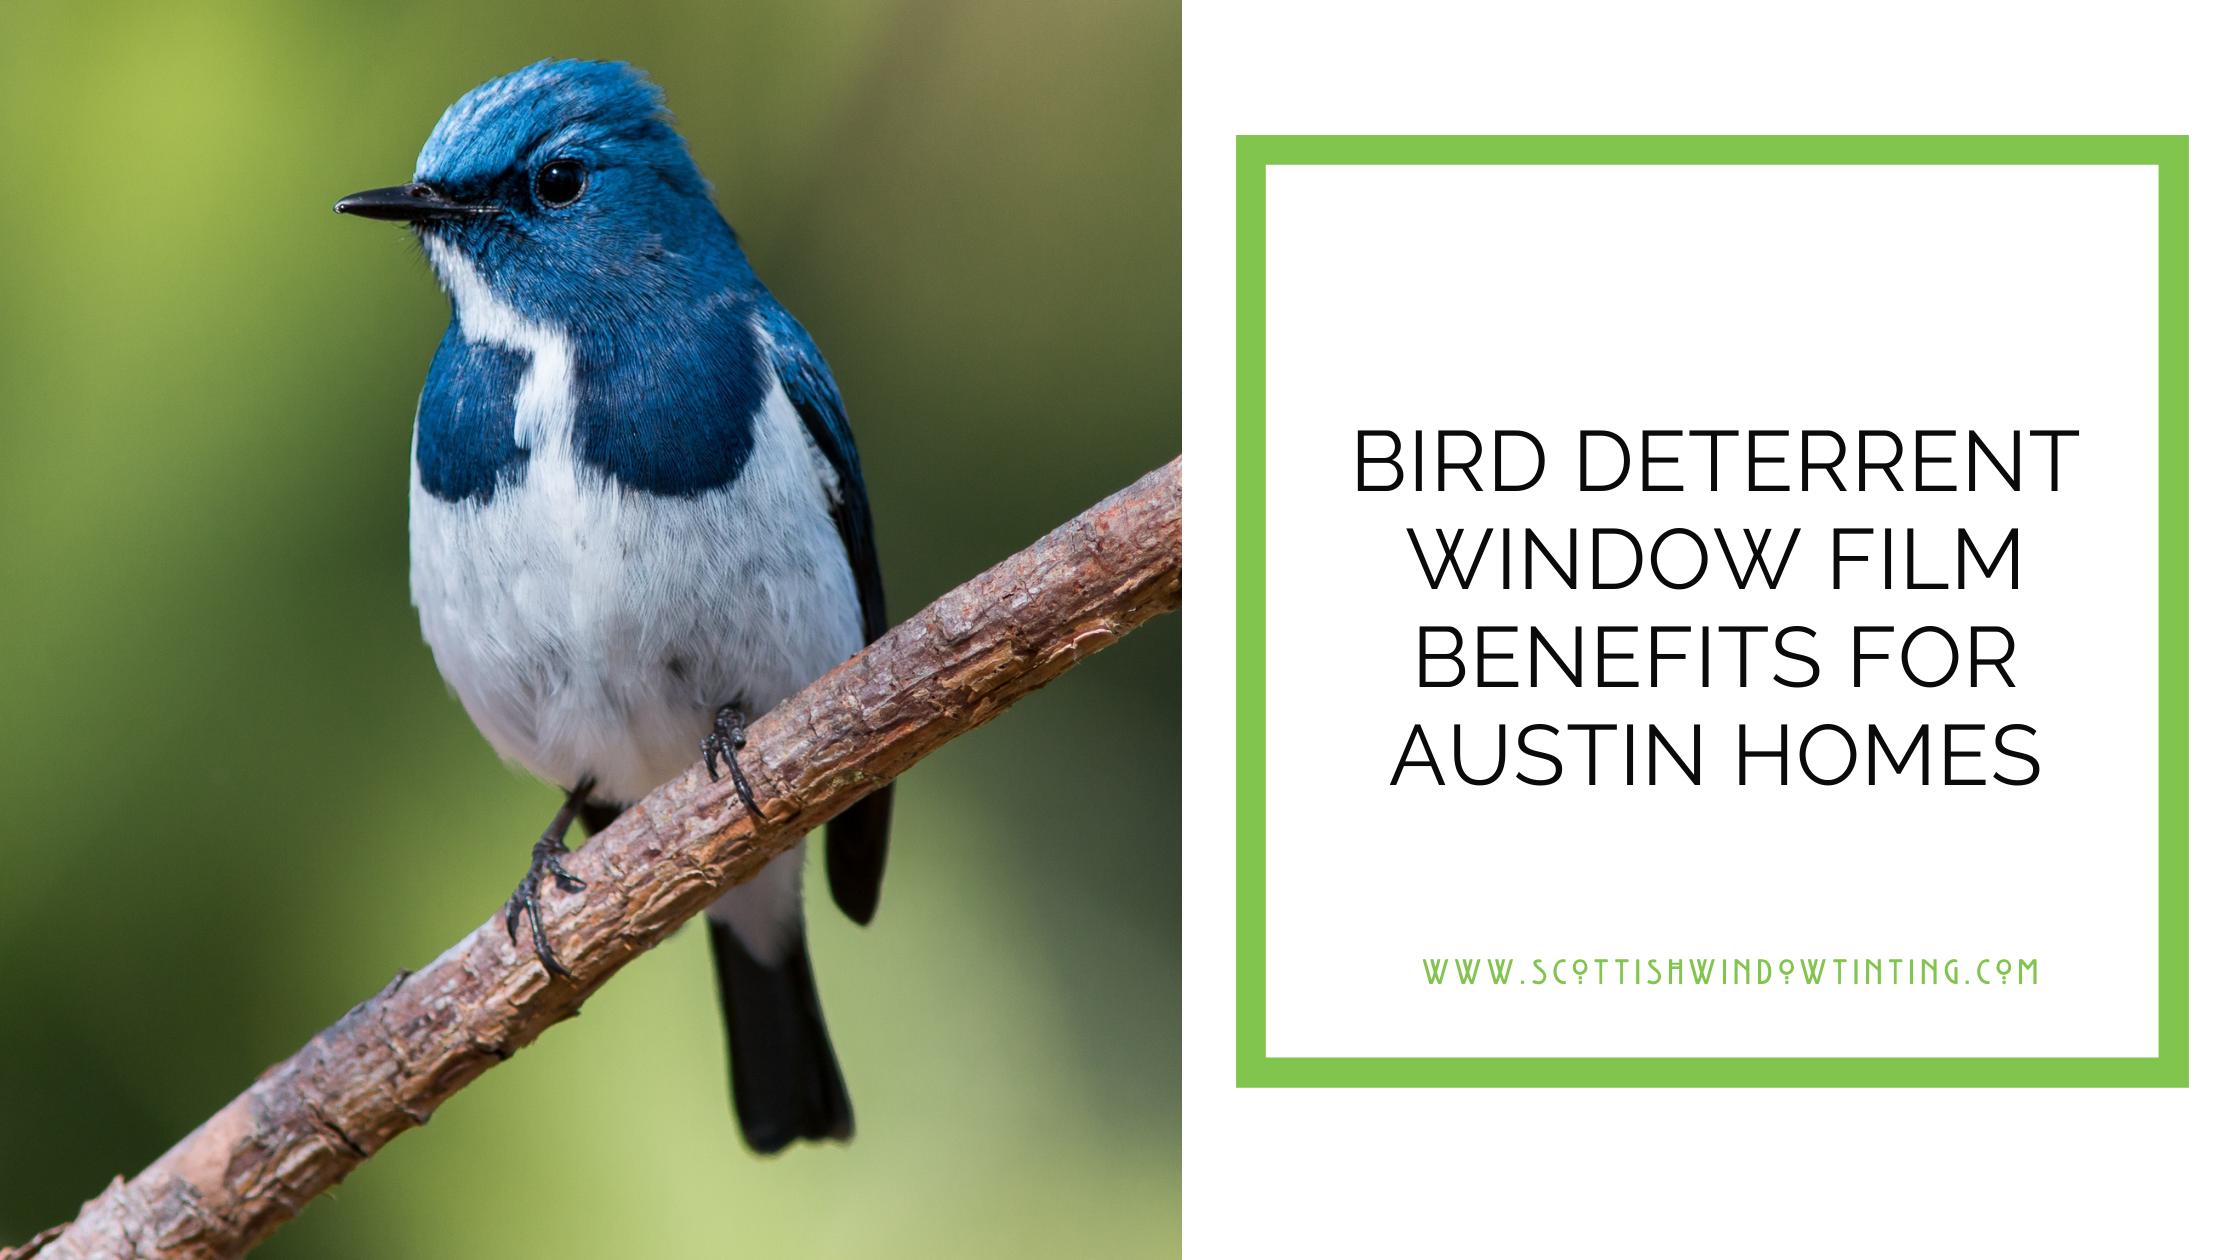 Bird Deterrent Window Film Benefits for Austin Homes